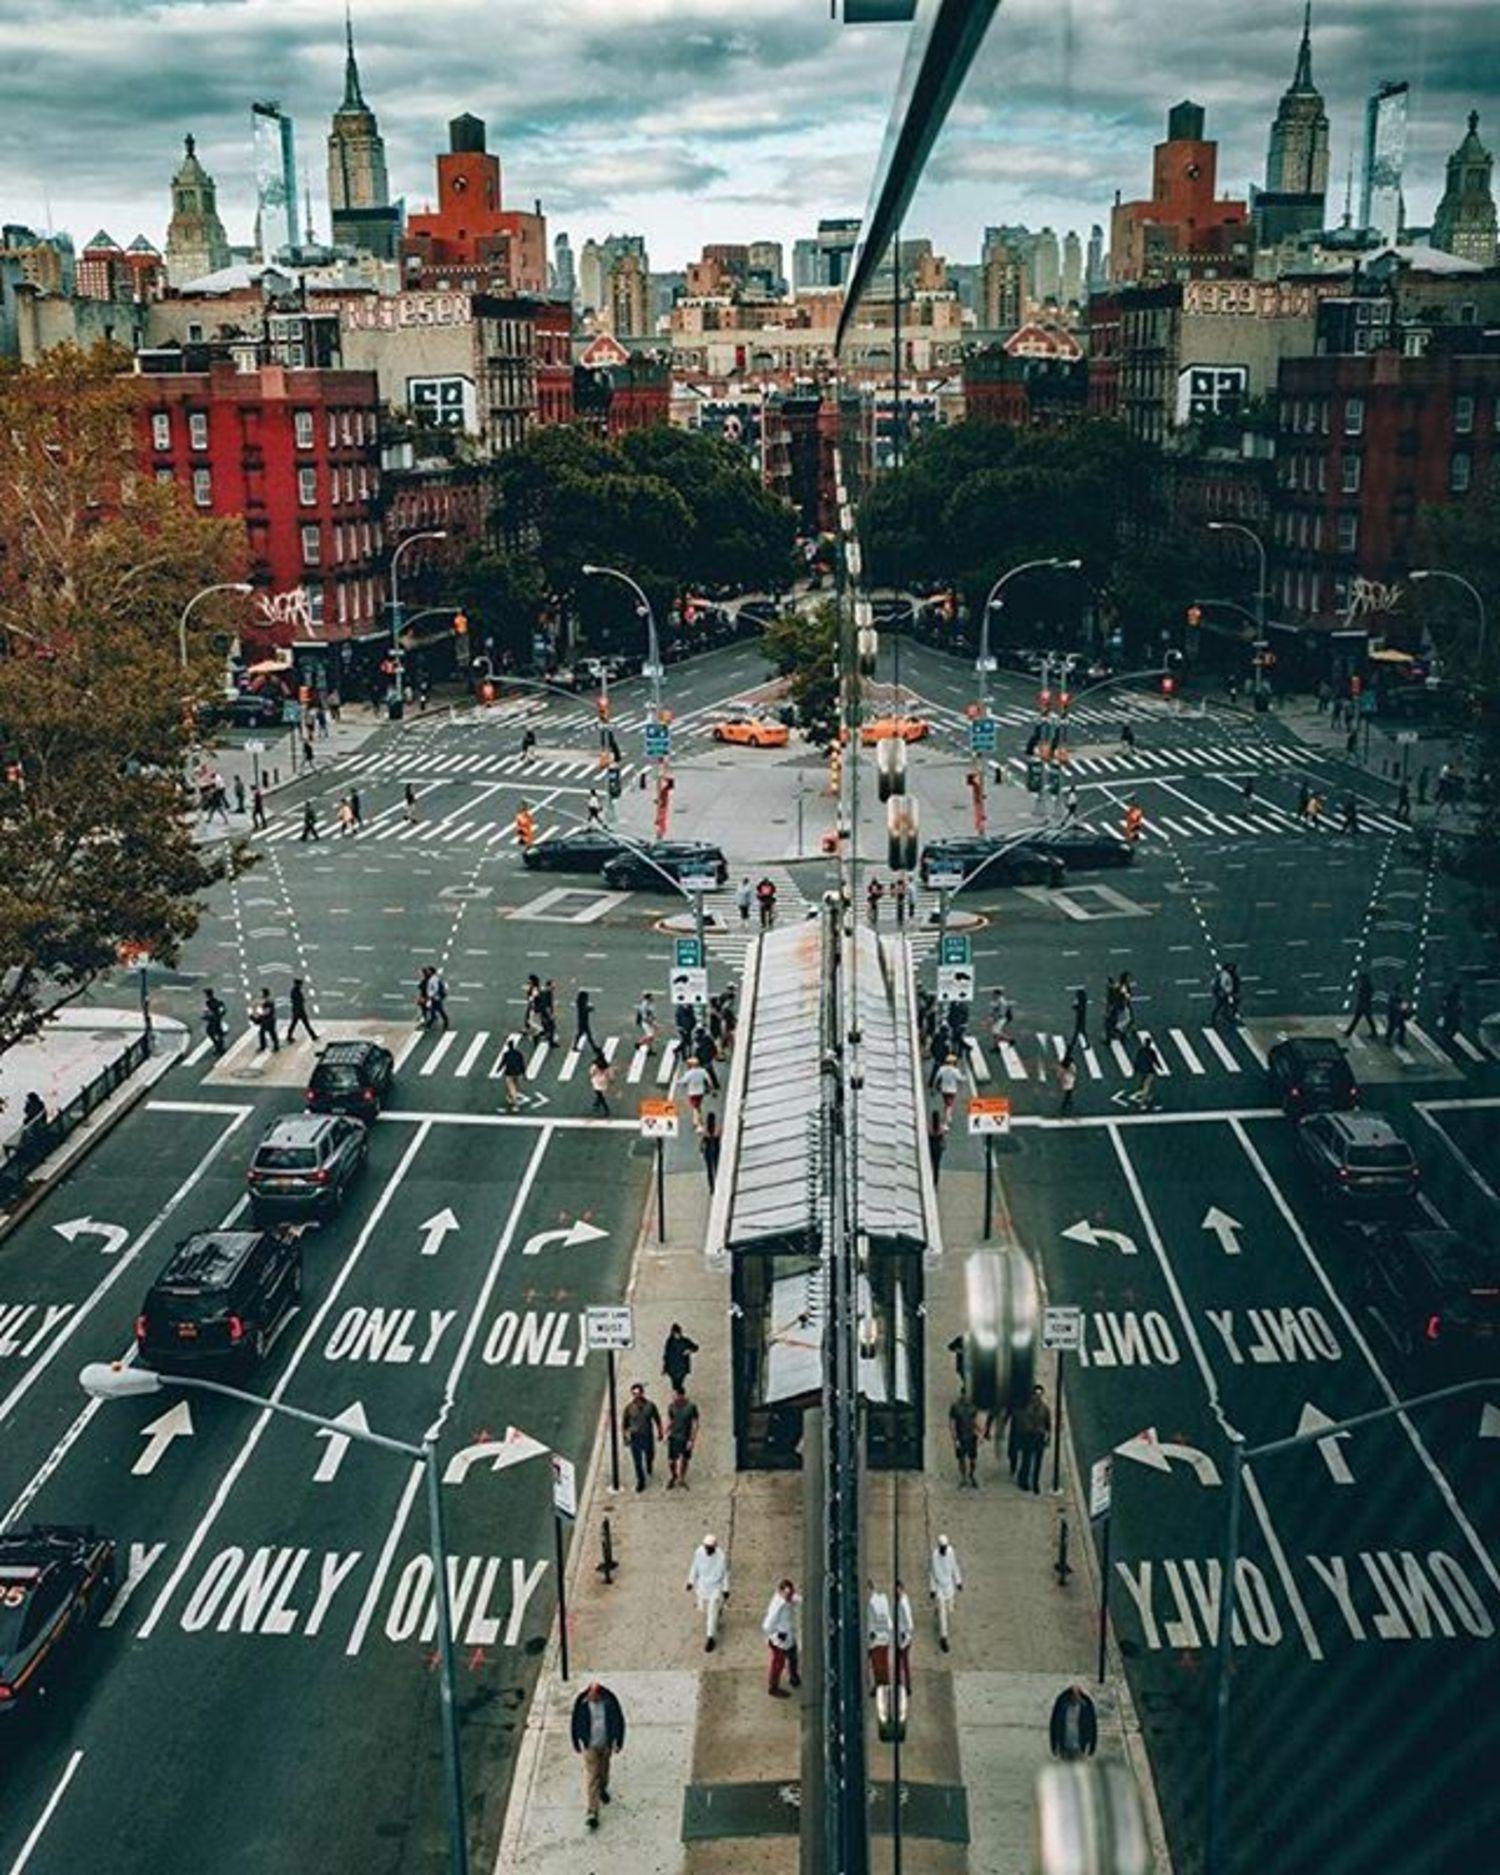 Lower East Side, Manhattan. Photo via @willnichols #viewingnyc #newyorkcity #newyork